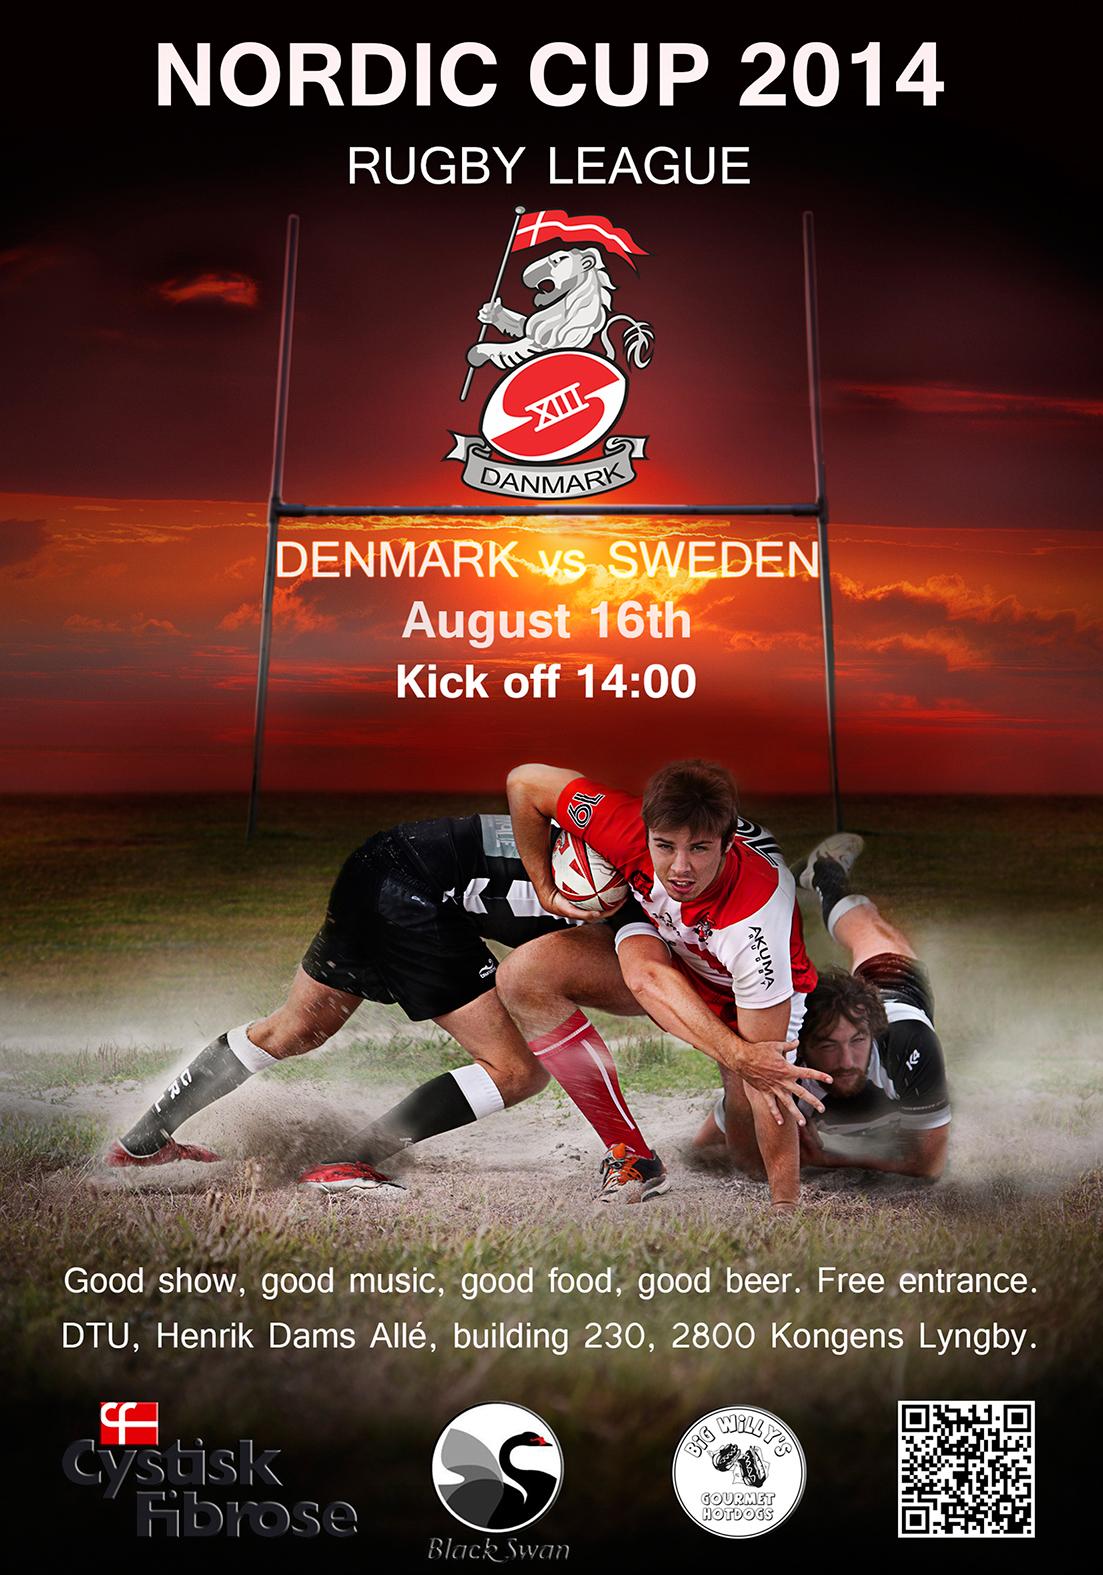 Danmark Rugby League